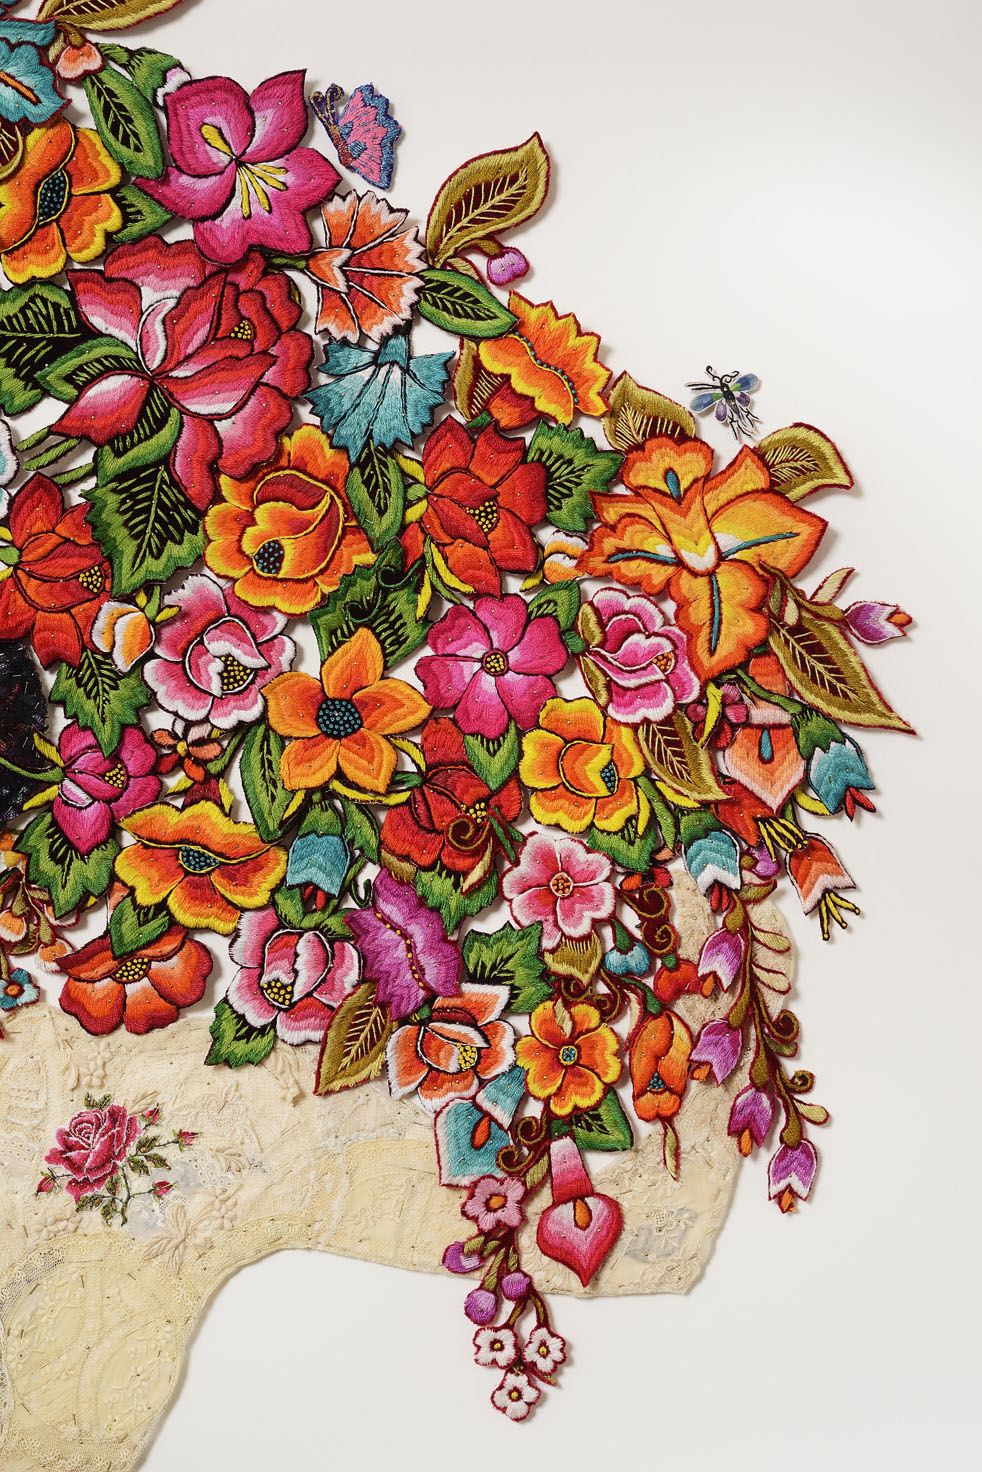 Detail - desnuda y flores 2015 after Diego Rivera 1944